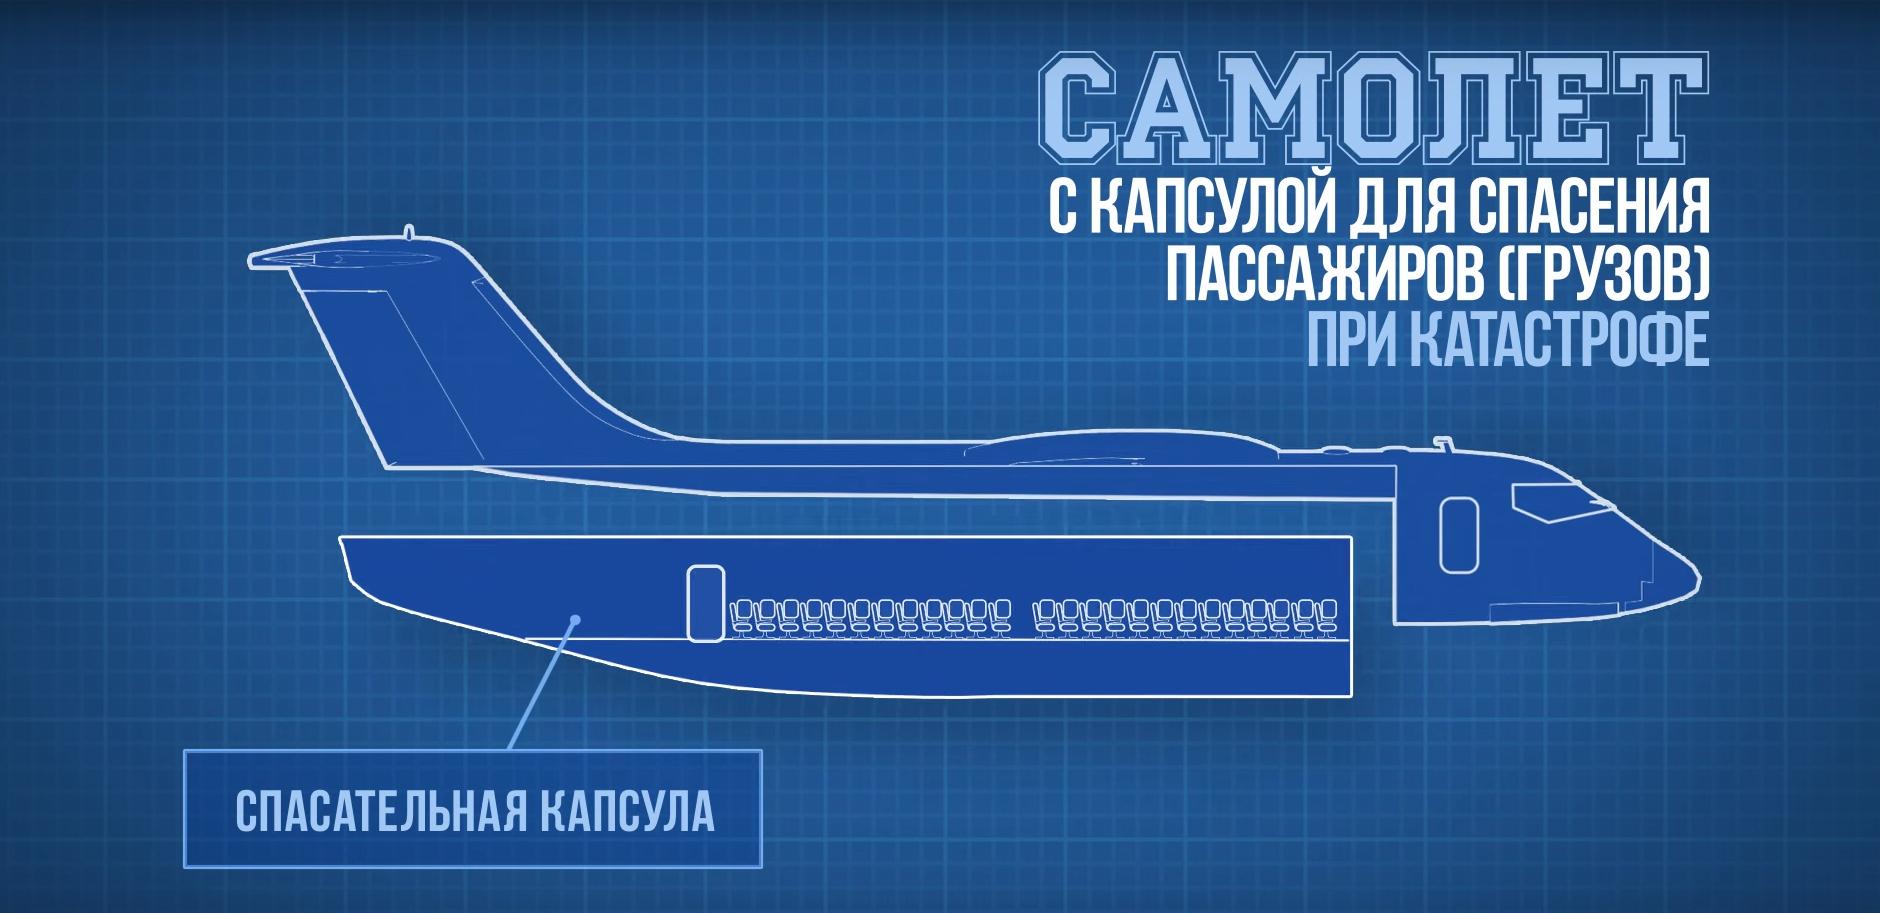 cabina avion desmontable segura 4